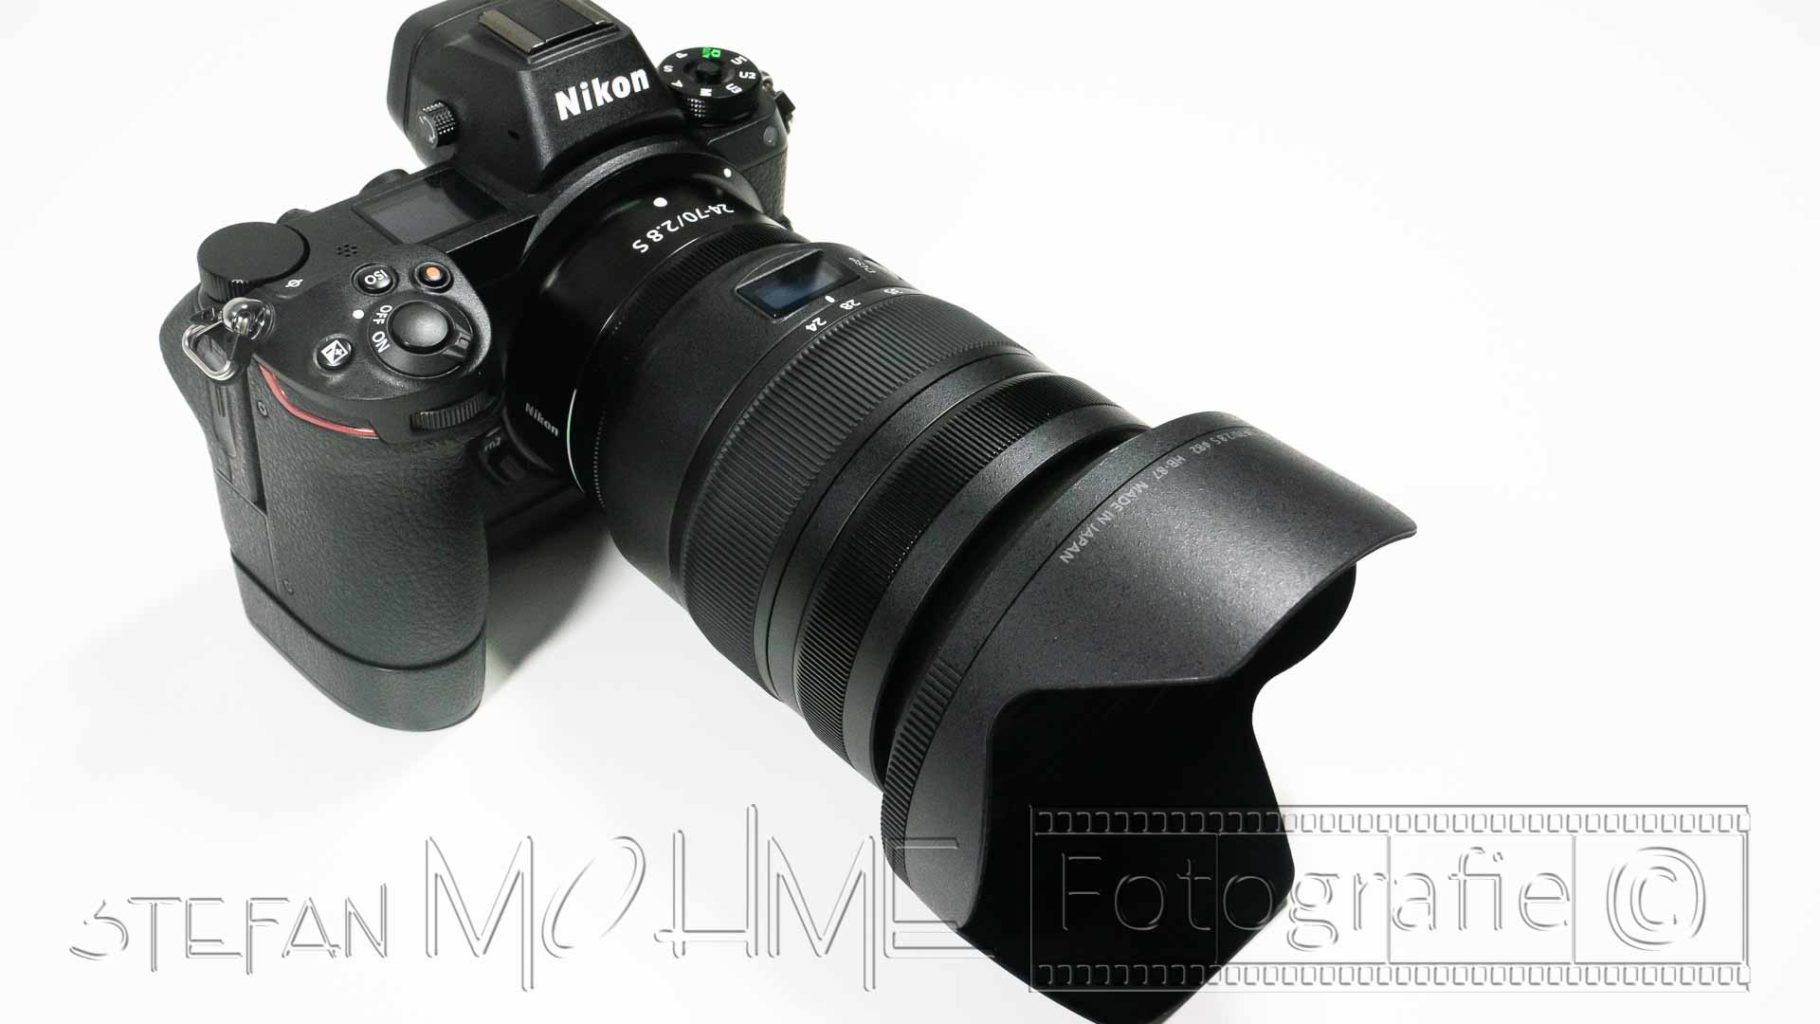 Nikon z7 & 24-70mm Objektiv